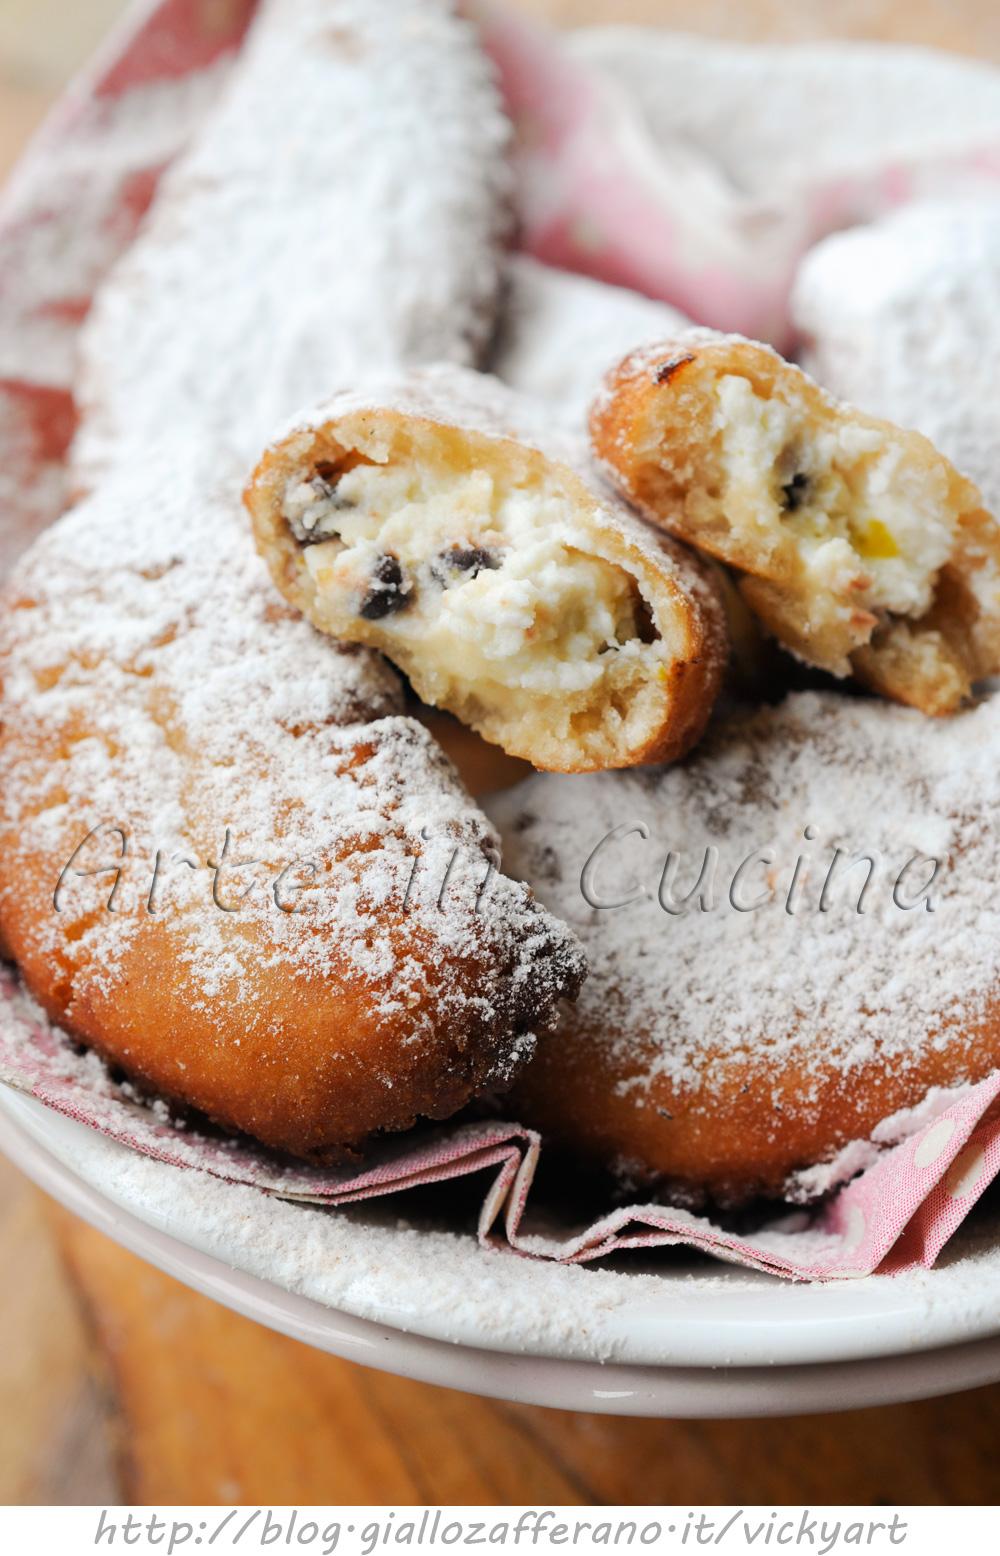 Cassatelle siciliane alla ricotta dolci di carnevale arte in cucina - Cucina macrobiotica dolci ...